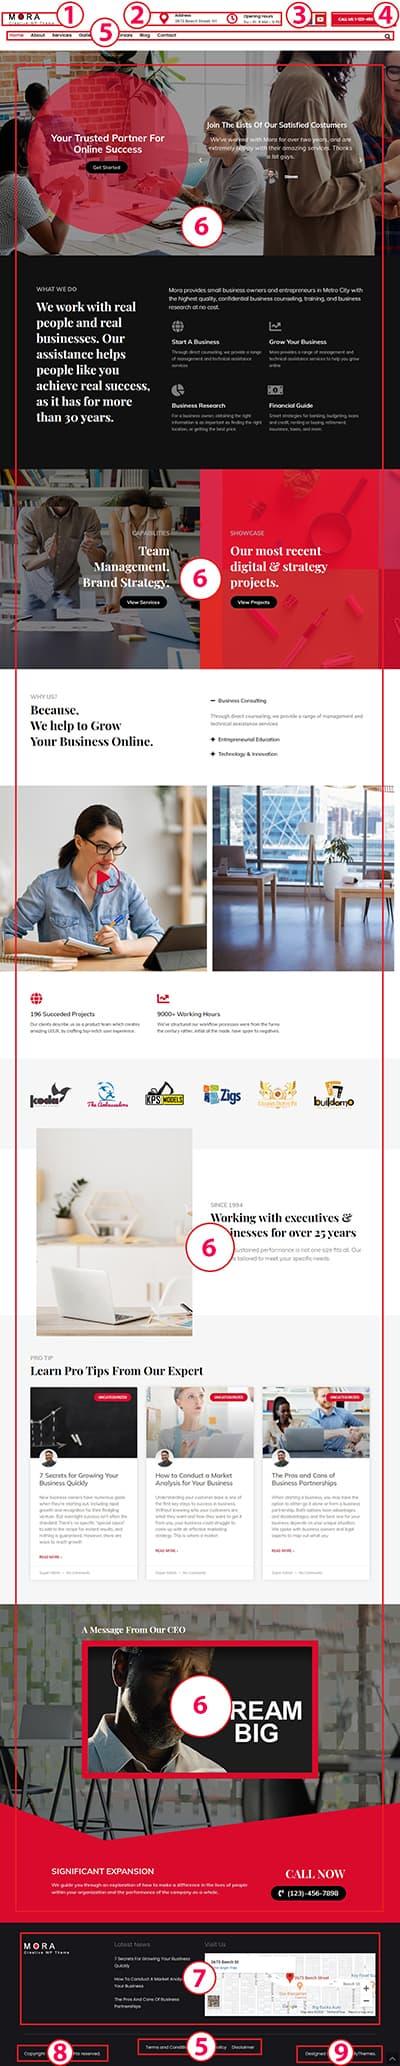 Mora Creative WordPress Theme  #1 Premium Theme Documentation